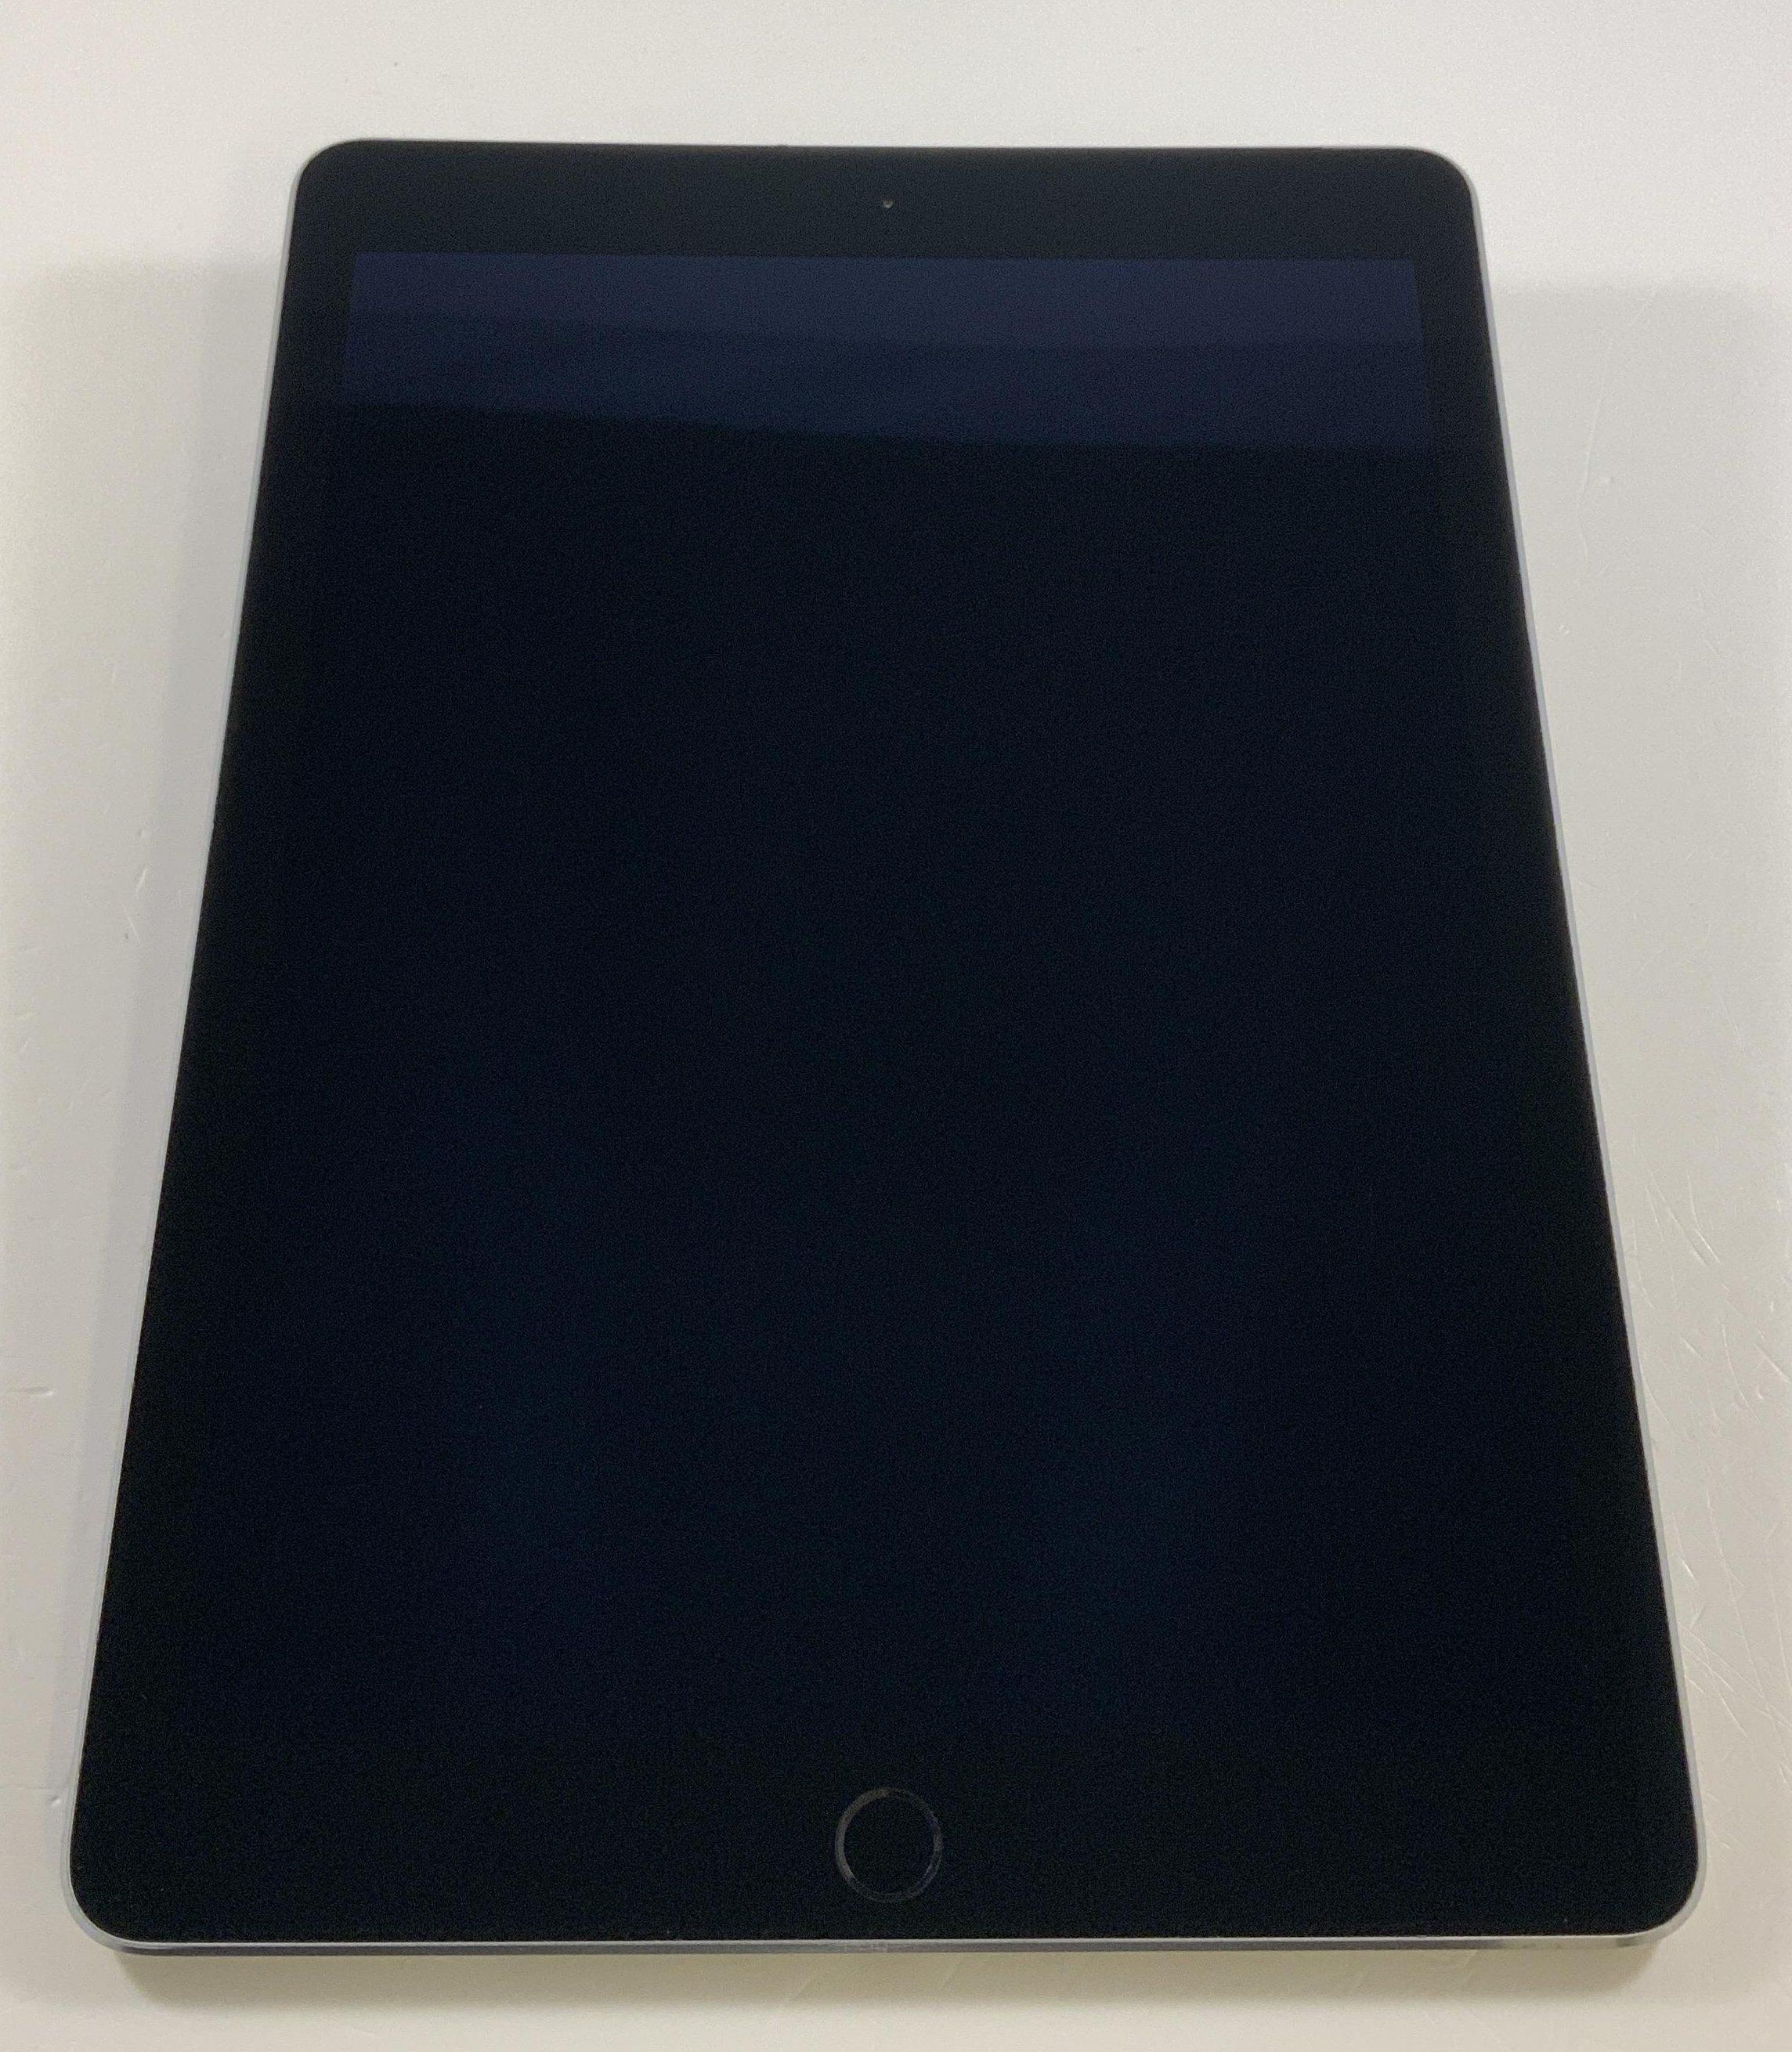 iPad Air 2 Wi-Fi + Cellular 64GB, 64GB, Space Gray, Bild 1